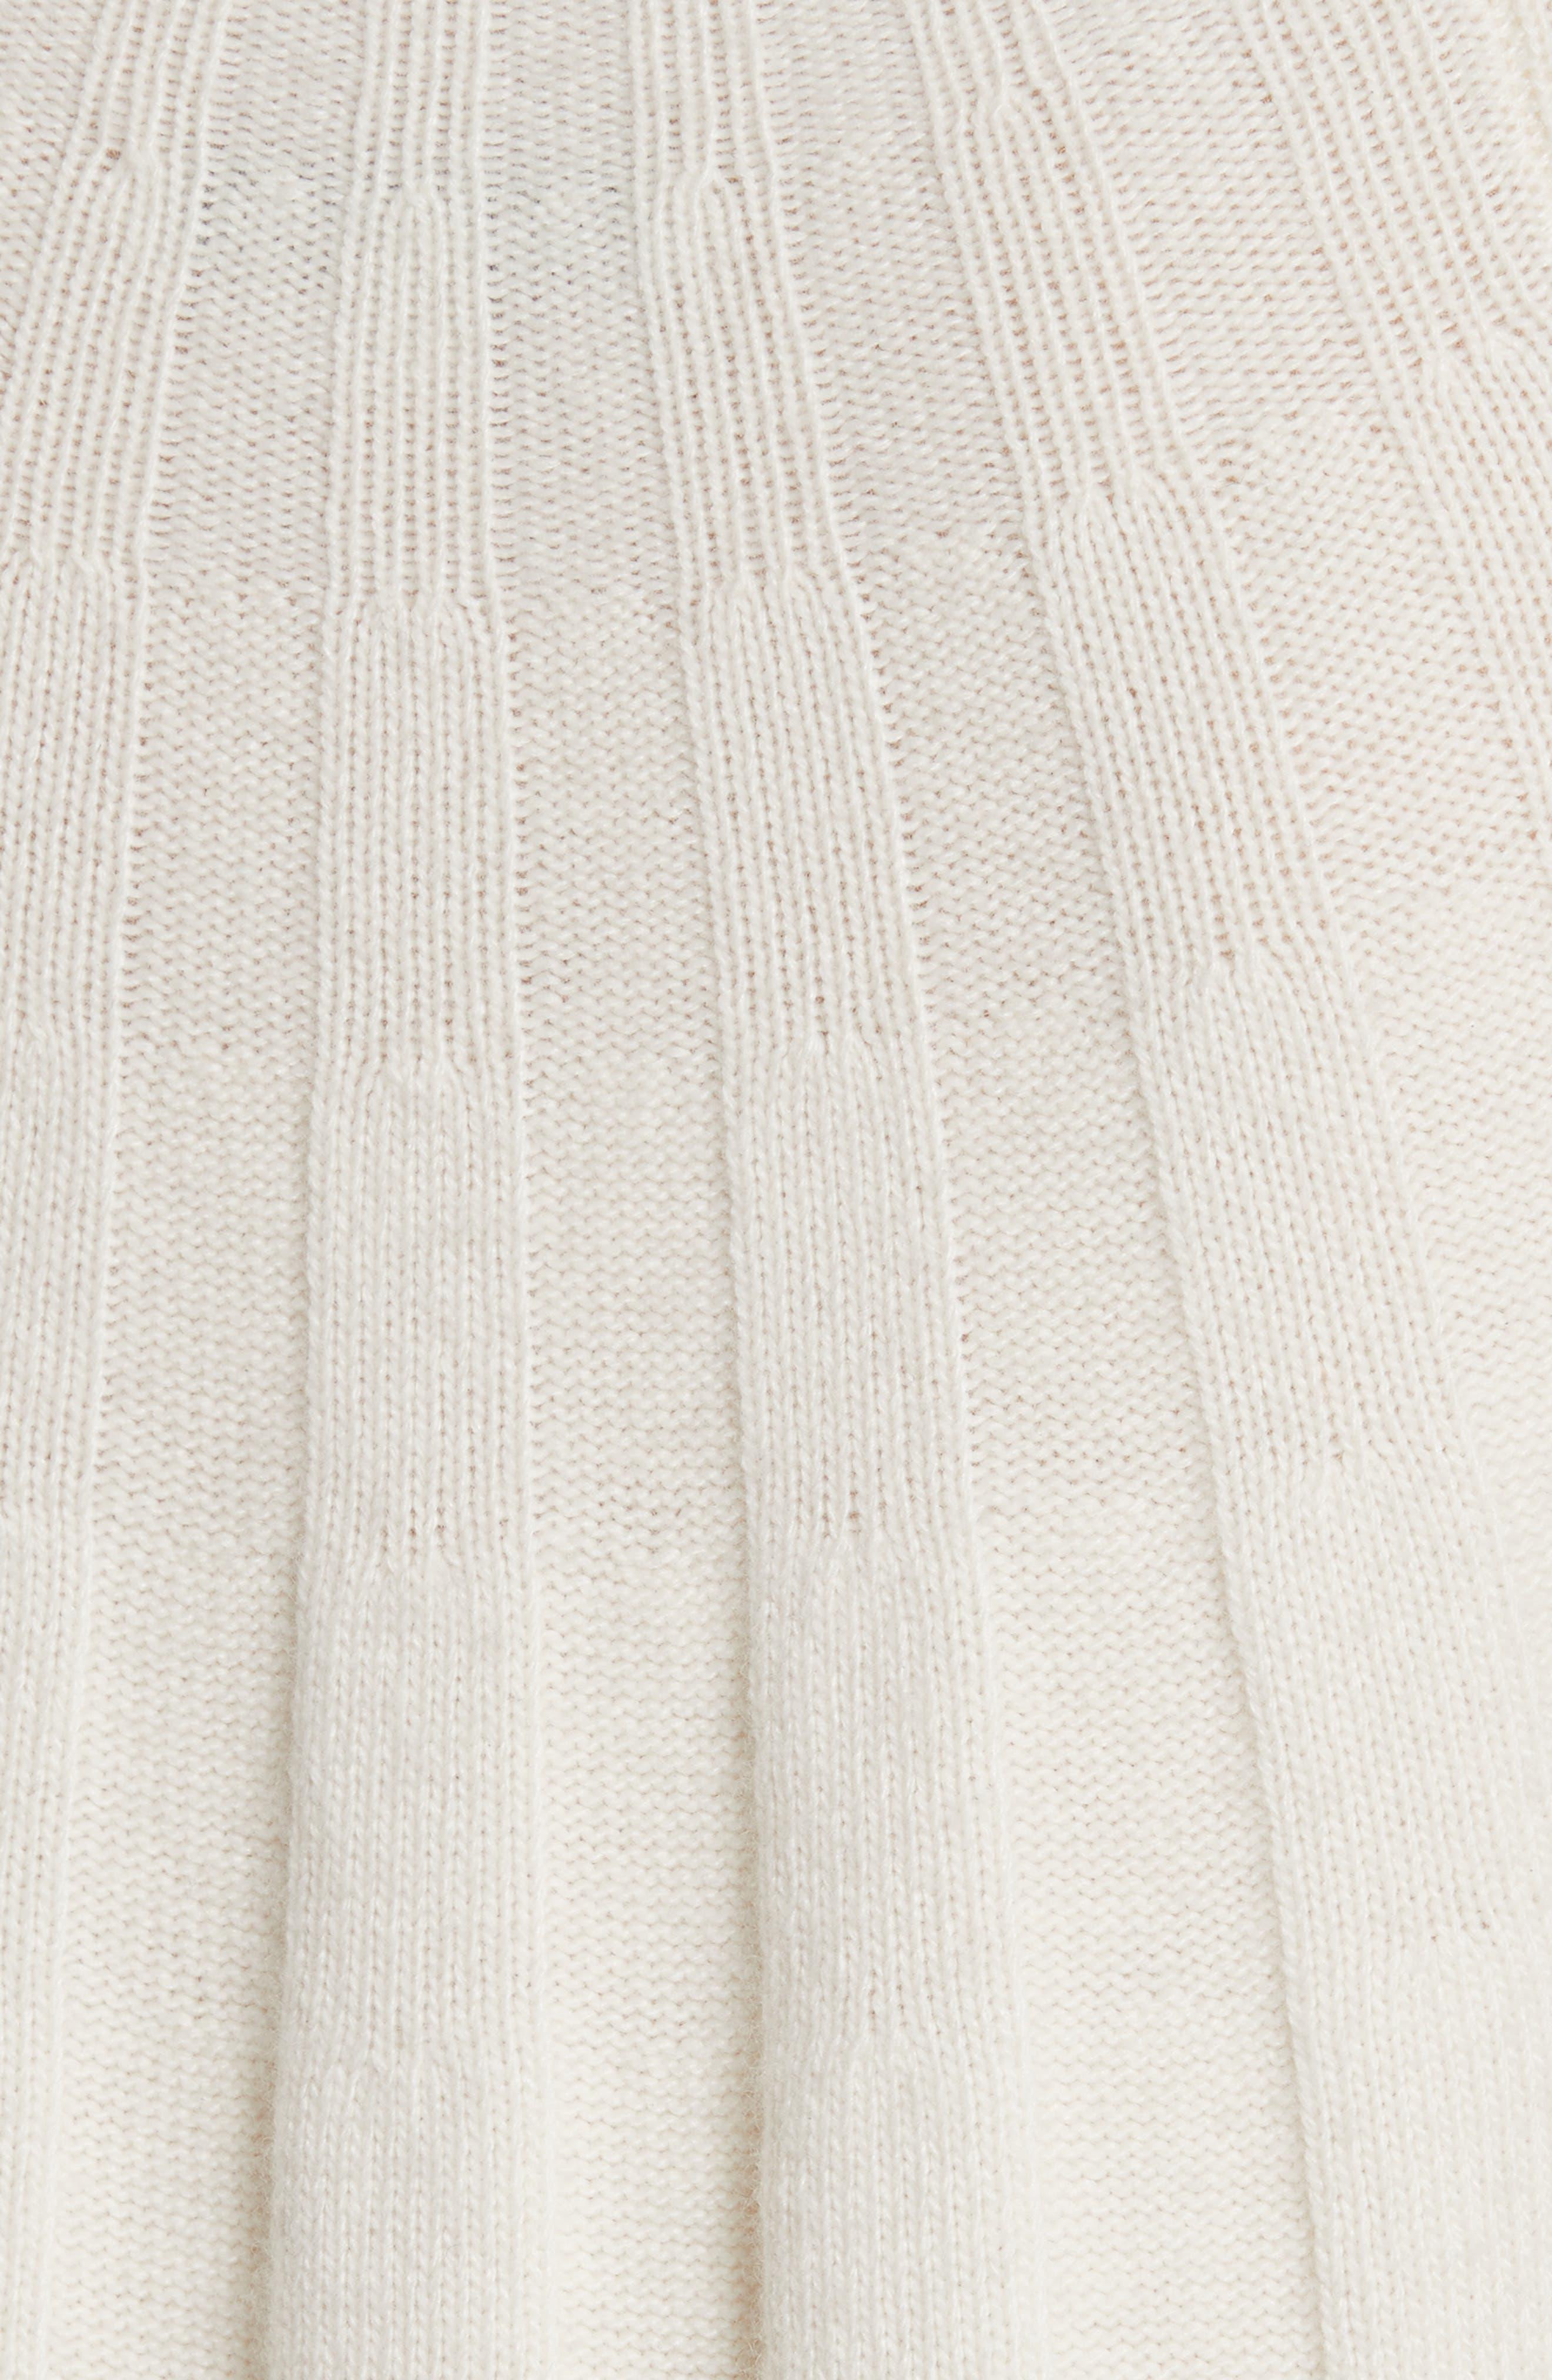 Gerri Knit Swing Dress,                             Alternate thumbnail 5, color,                             Ivory